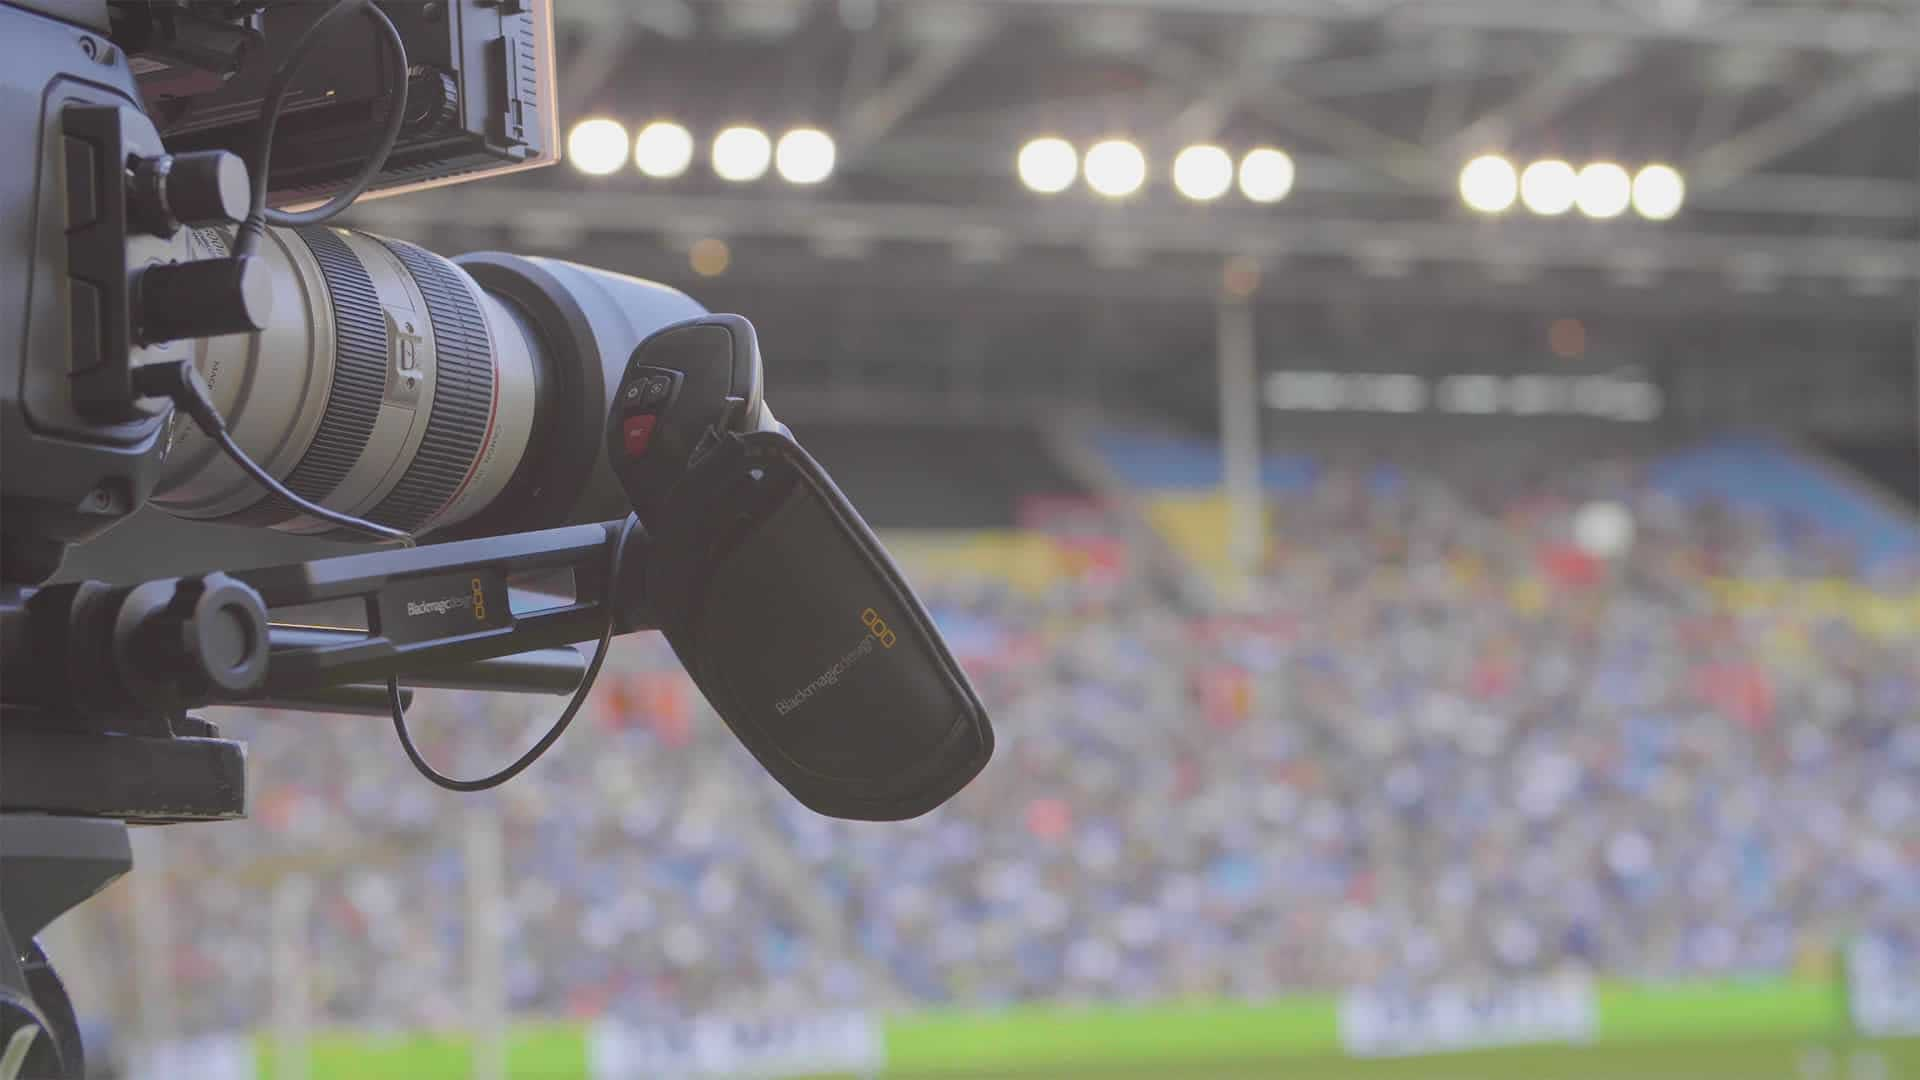 Cameraman nodig